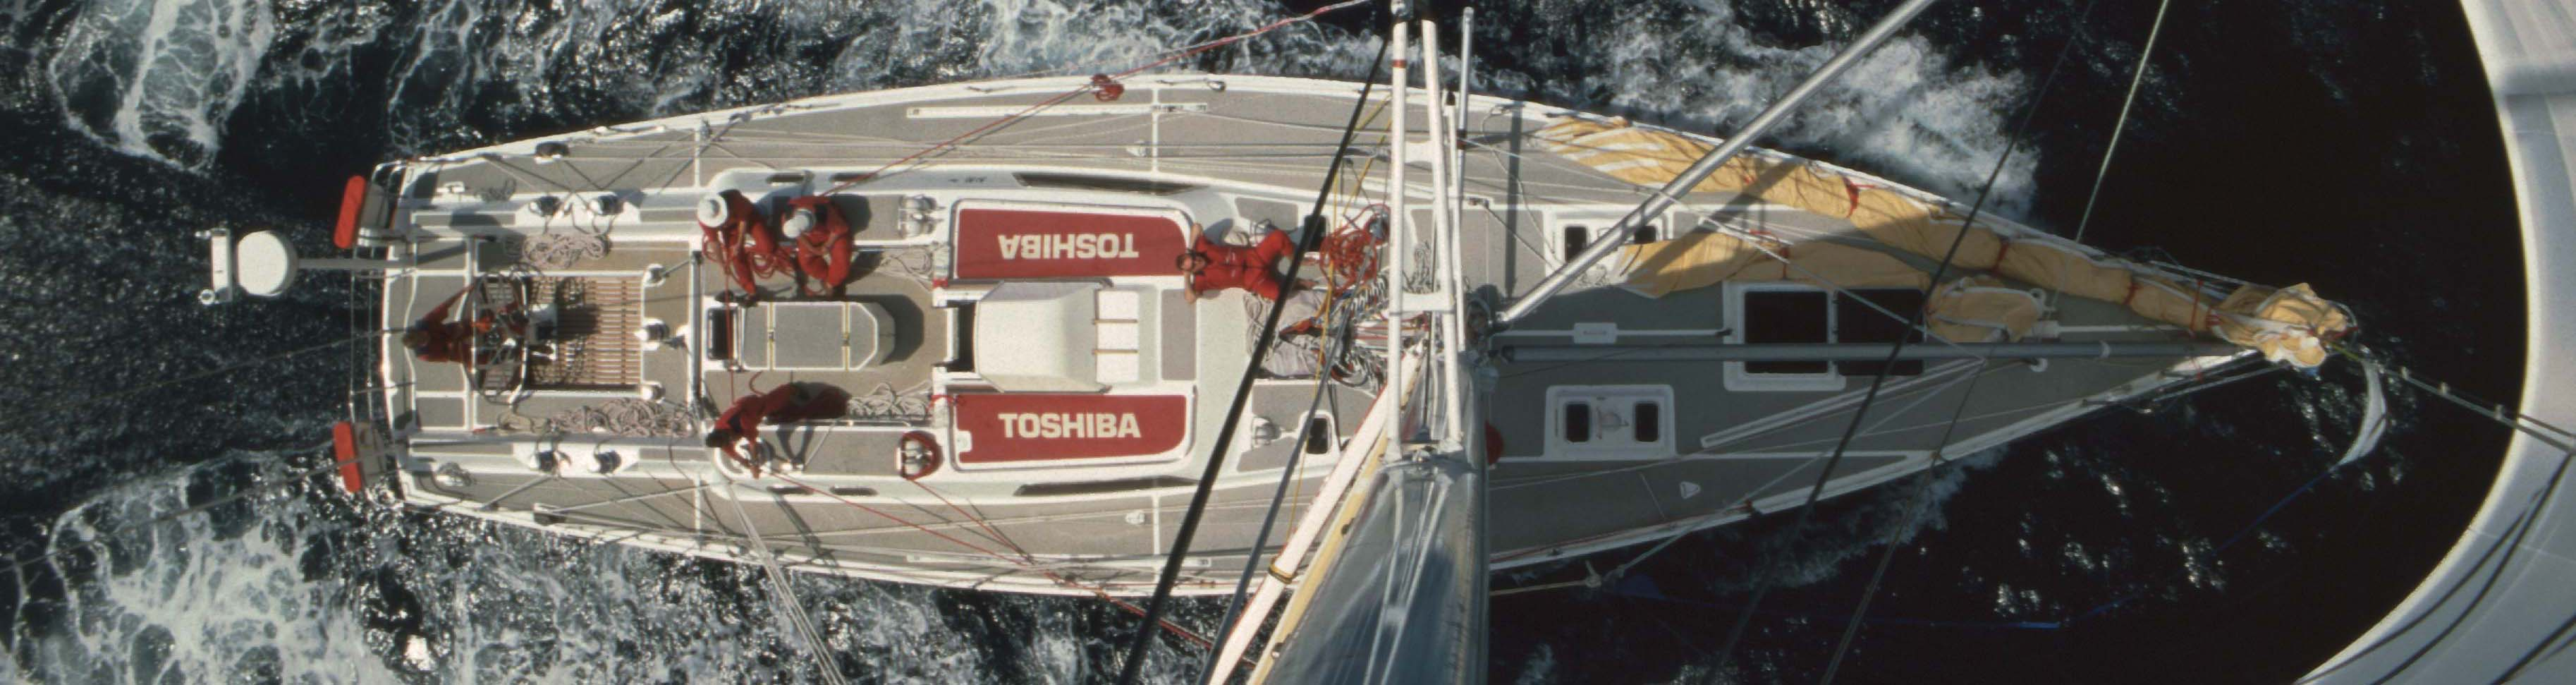 tosh-slot